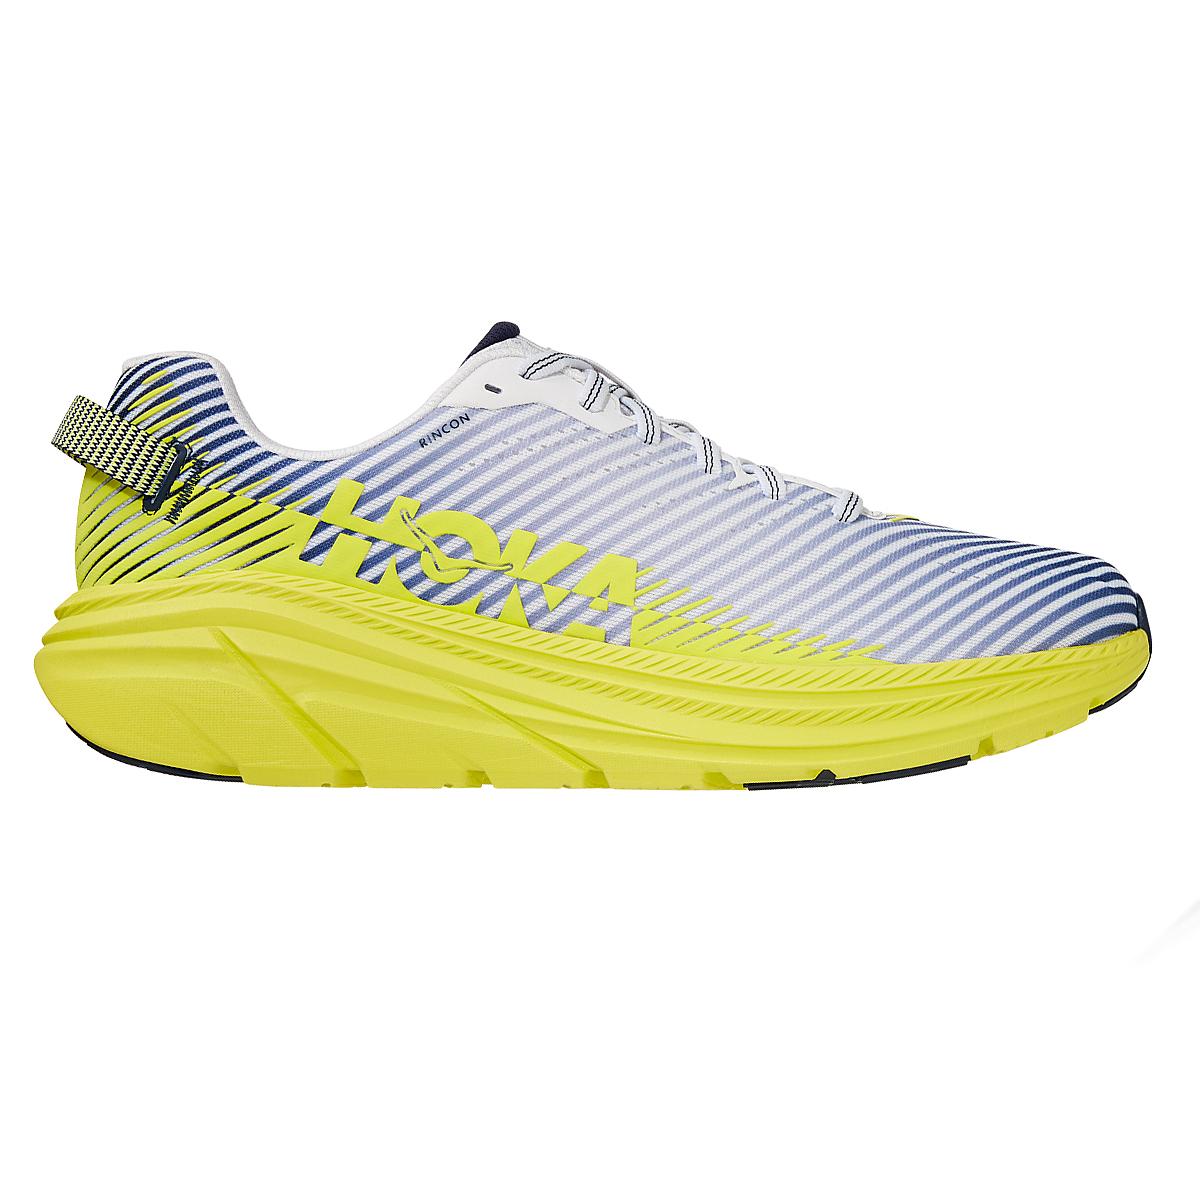 Footwear Under $80: Hoka One One Rincon 2 Running Shoe $73.98 + Free Shipping